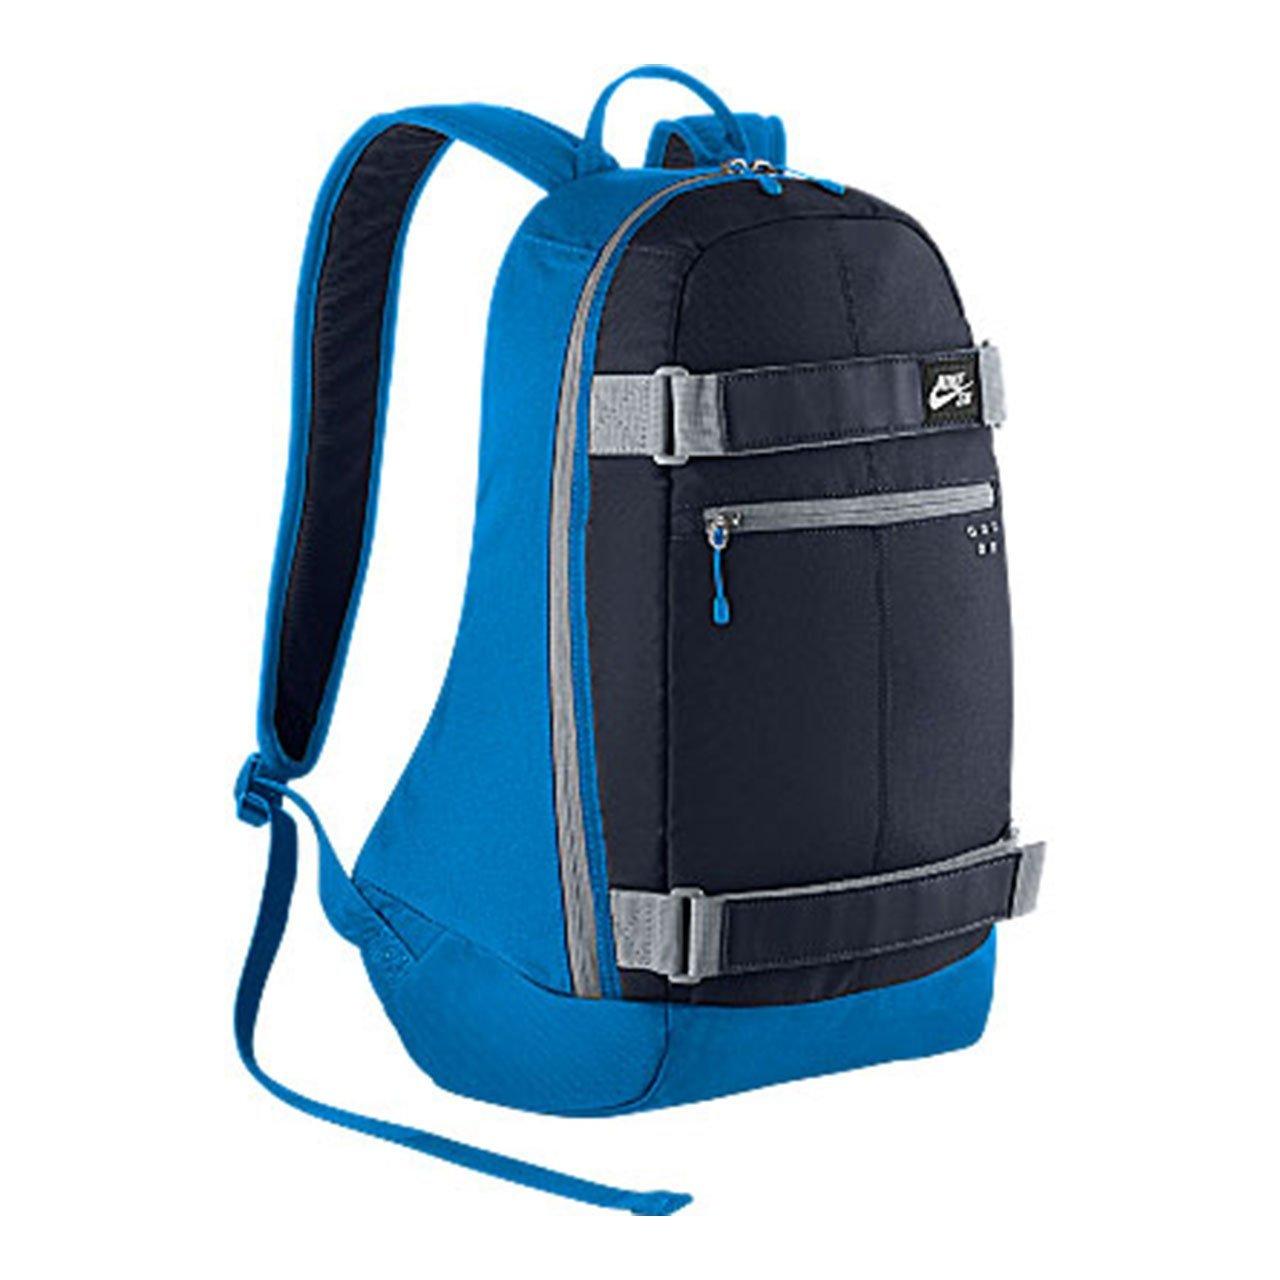 a80d2228c75c Get Quotations · Nike SB Embarca Medium Skateboarding Backpack